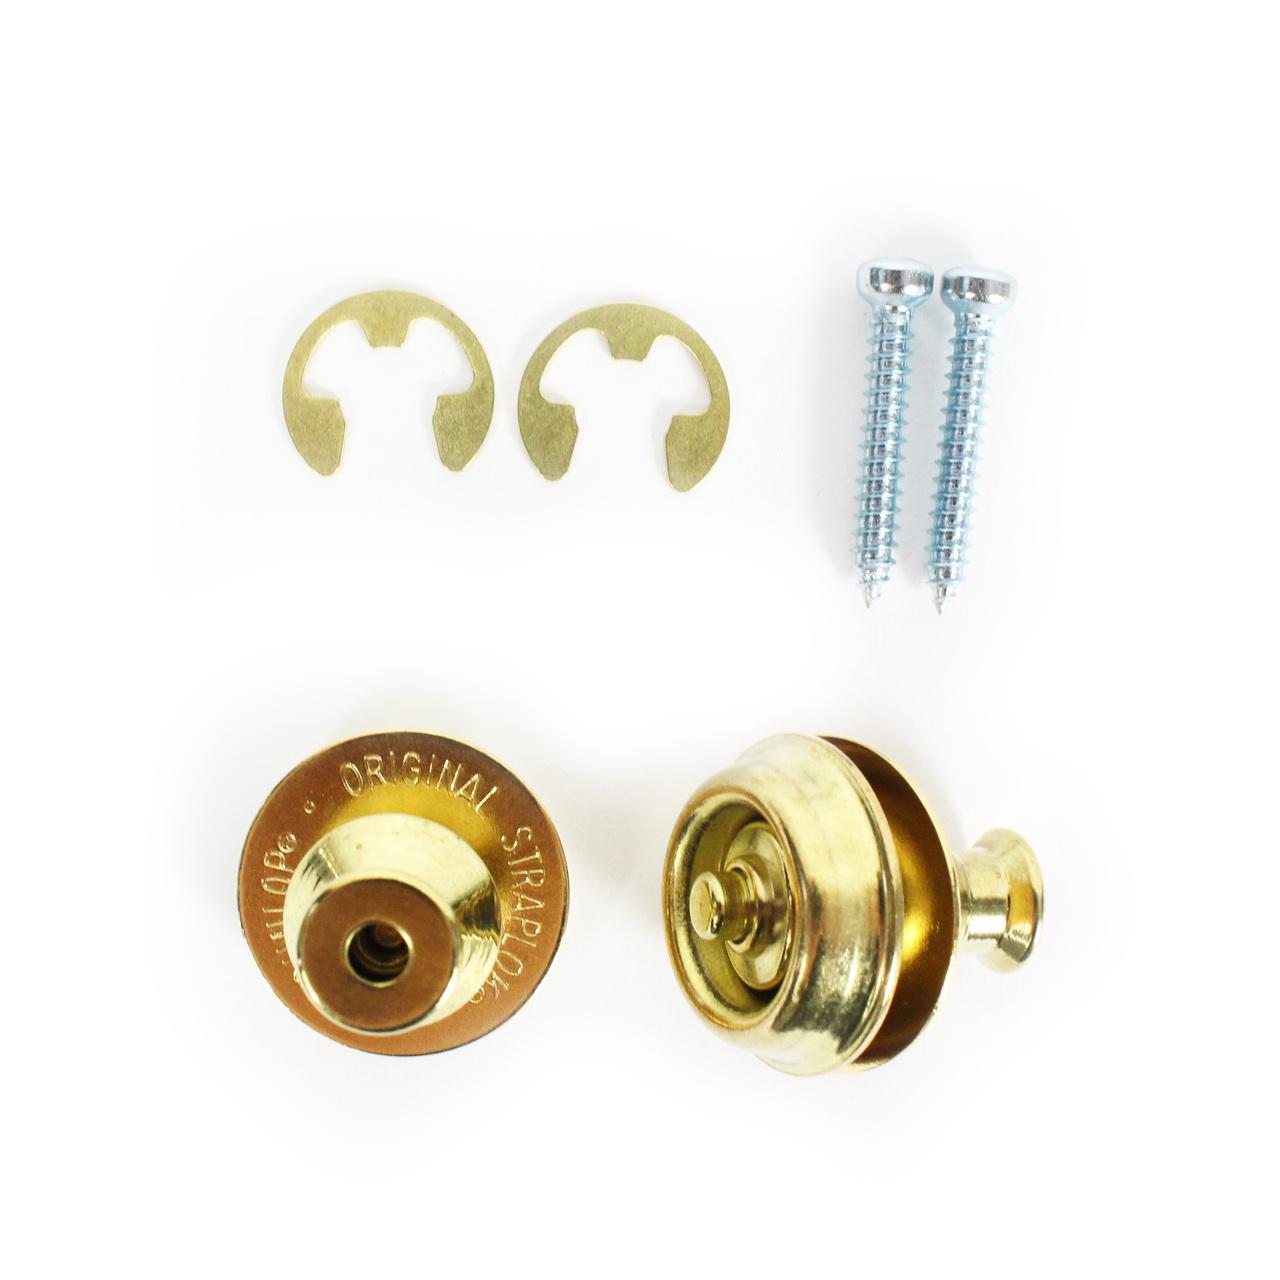 Dunlop Dual Design Straplok Strap Lock System BRASS NEW SLS1032BR